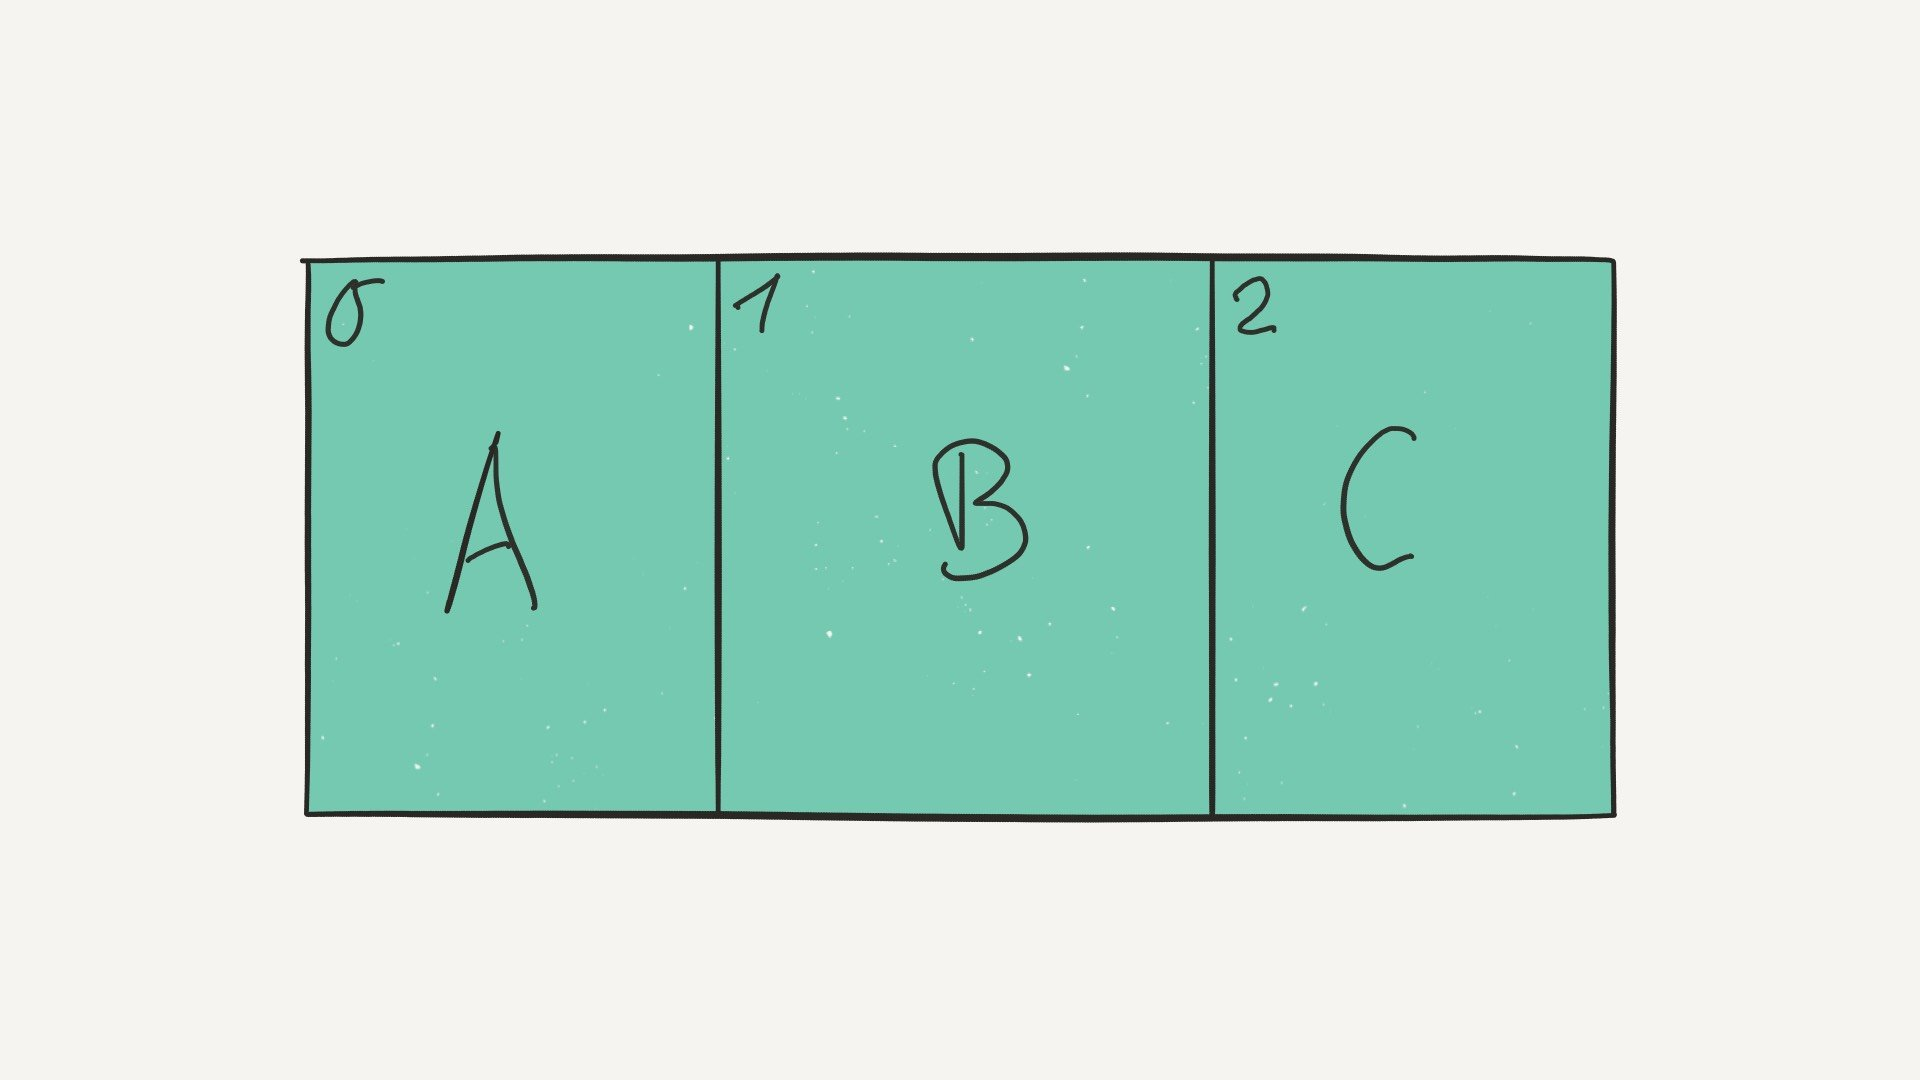 Visual representation of an array